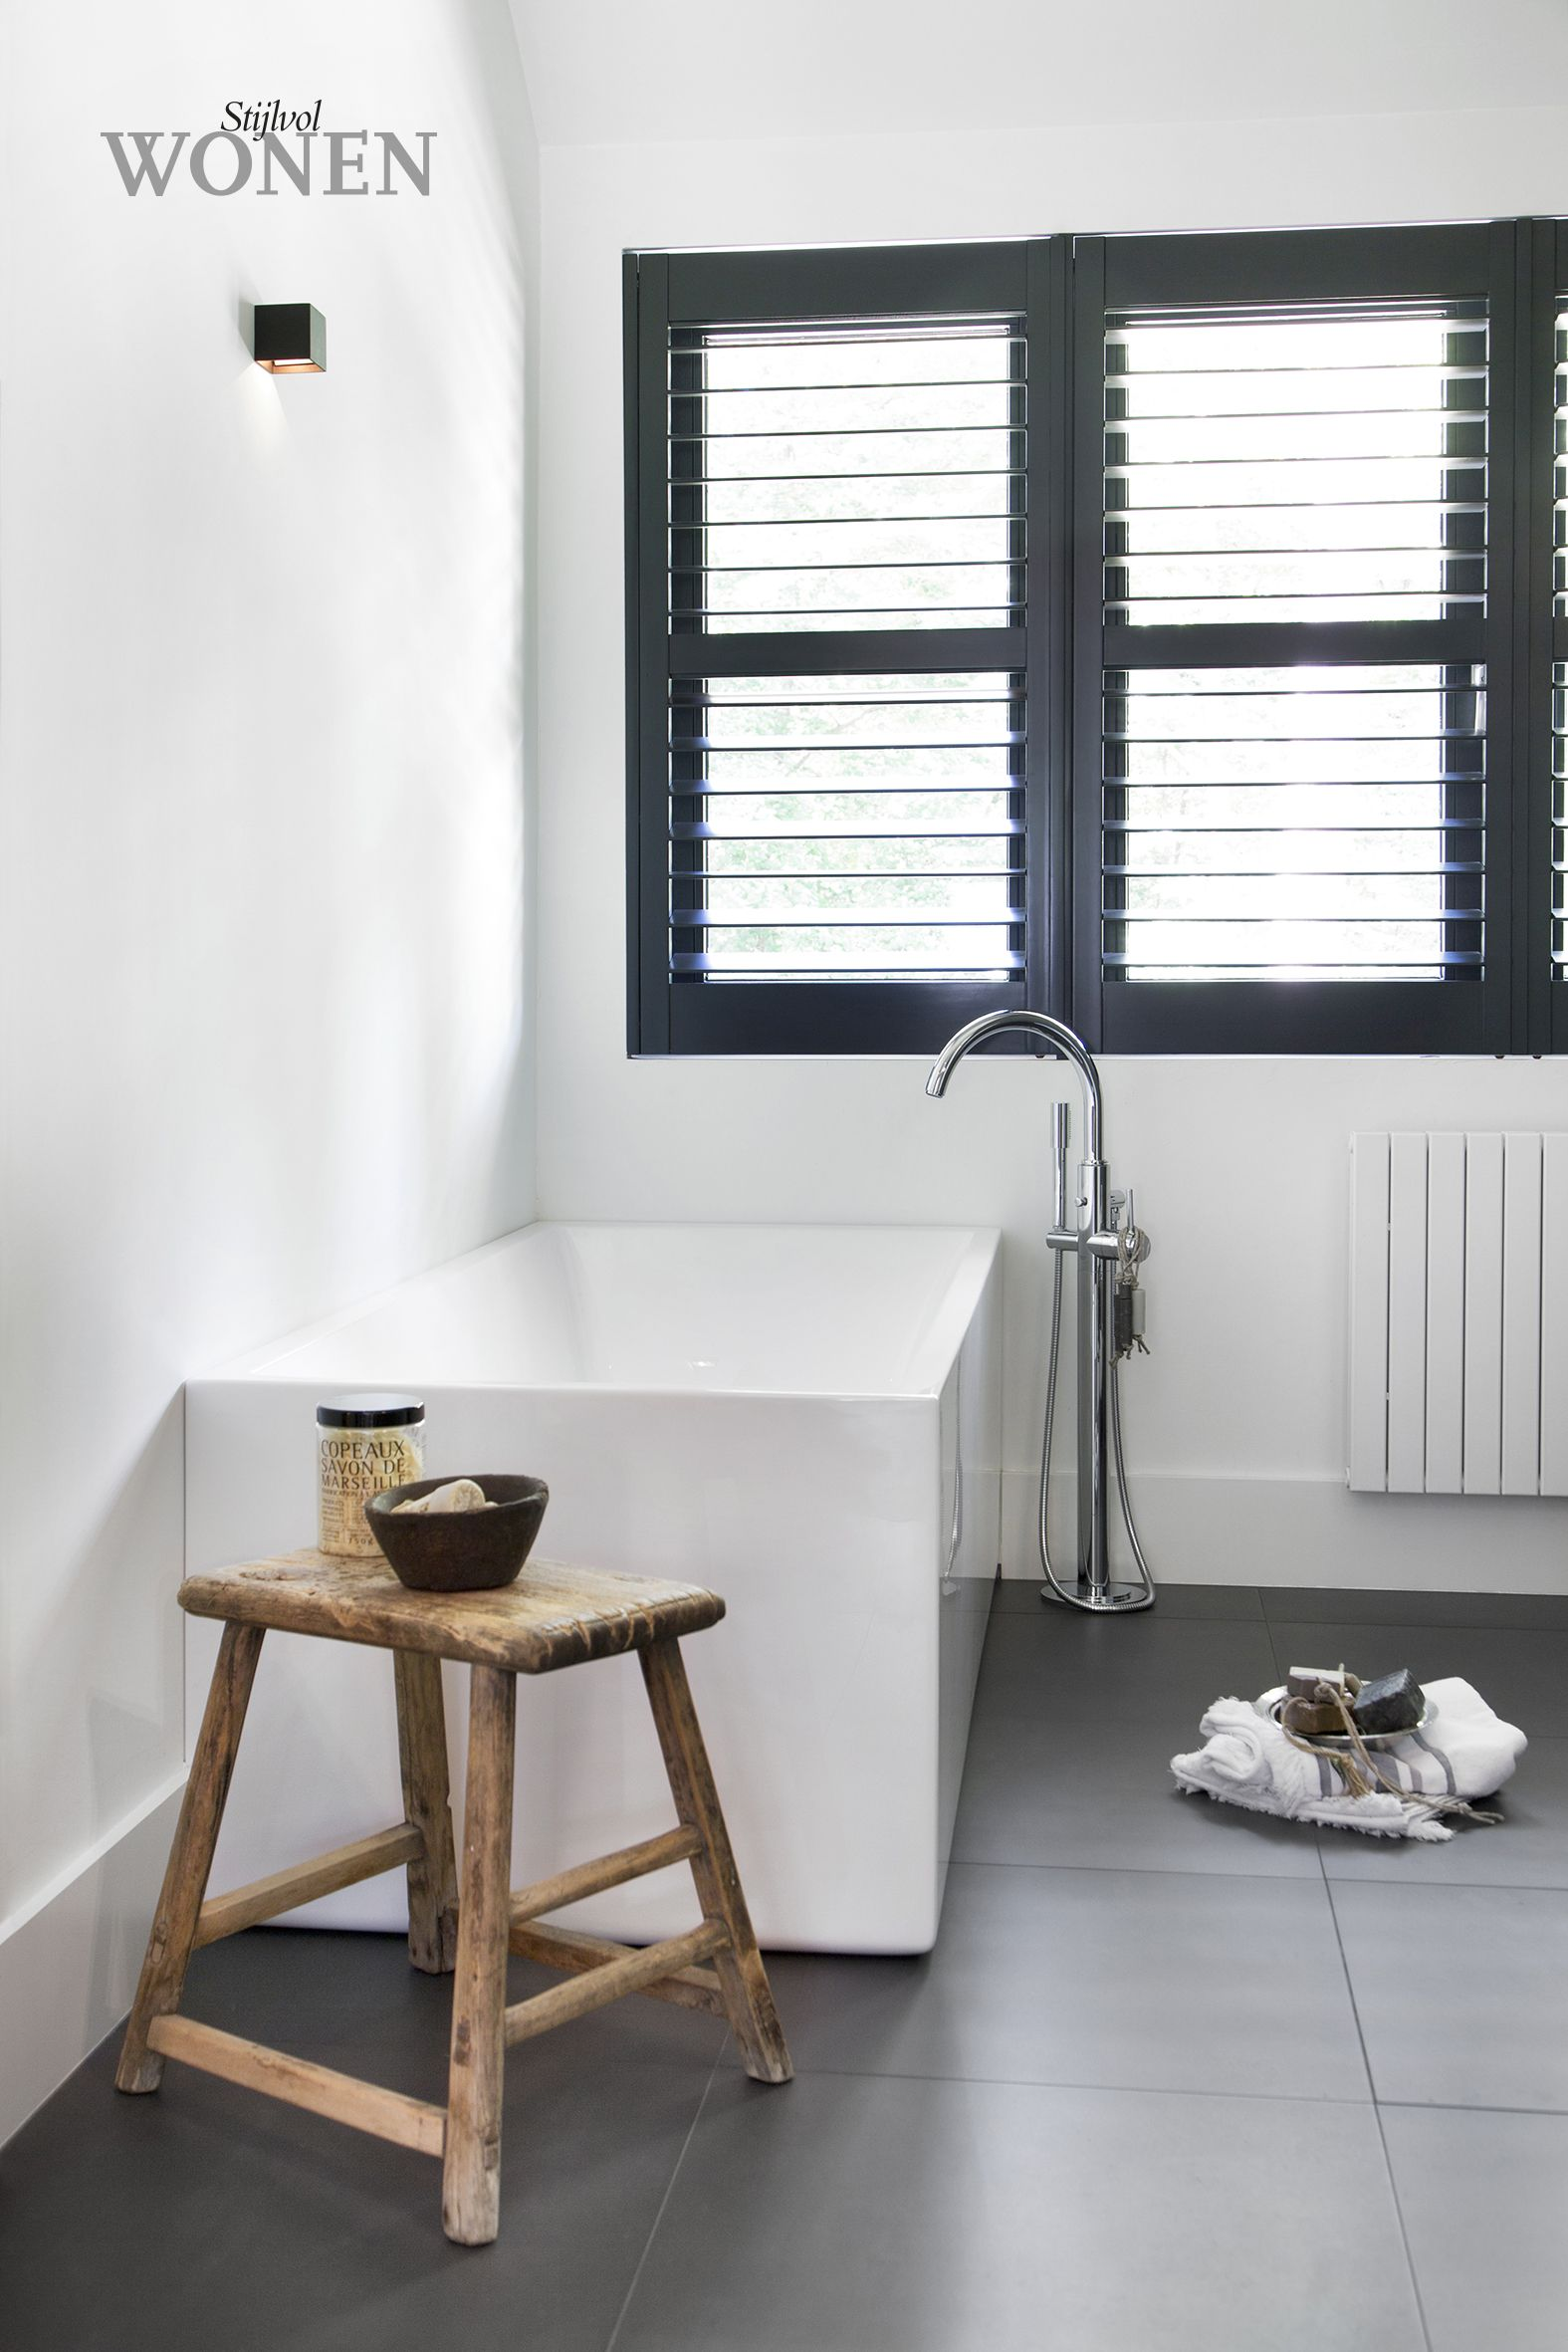 moderne badkamer met prachtige donkere tegels en donkere shutters